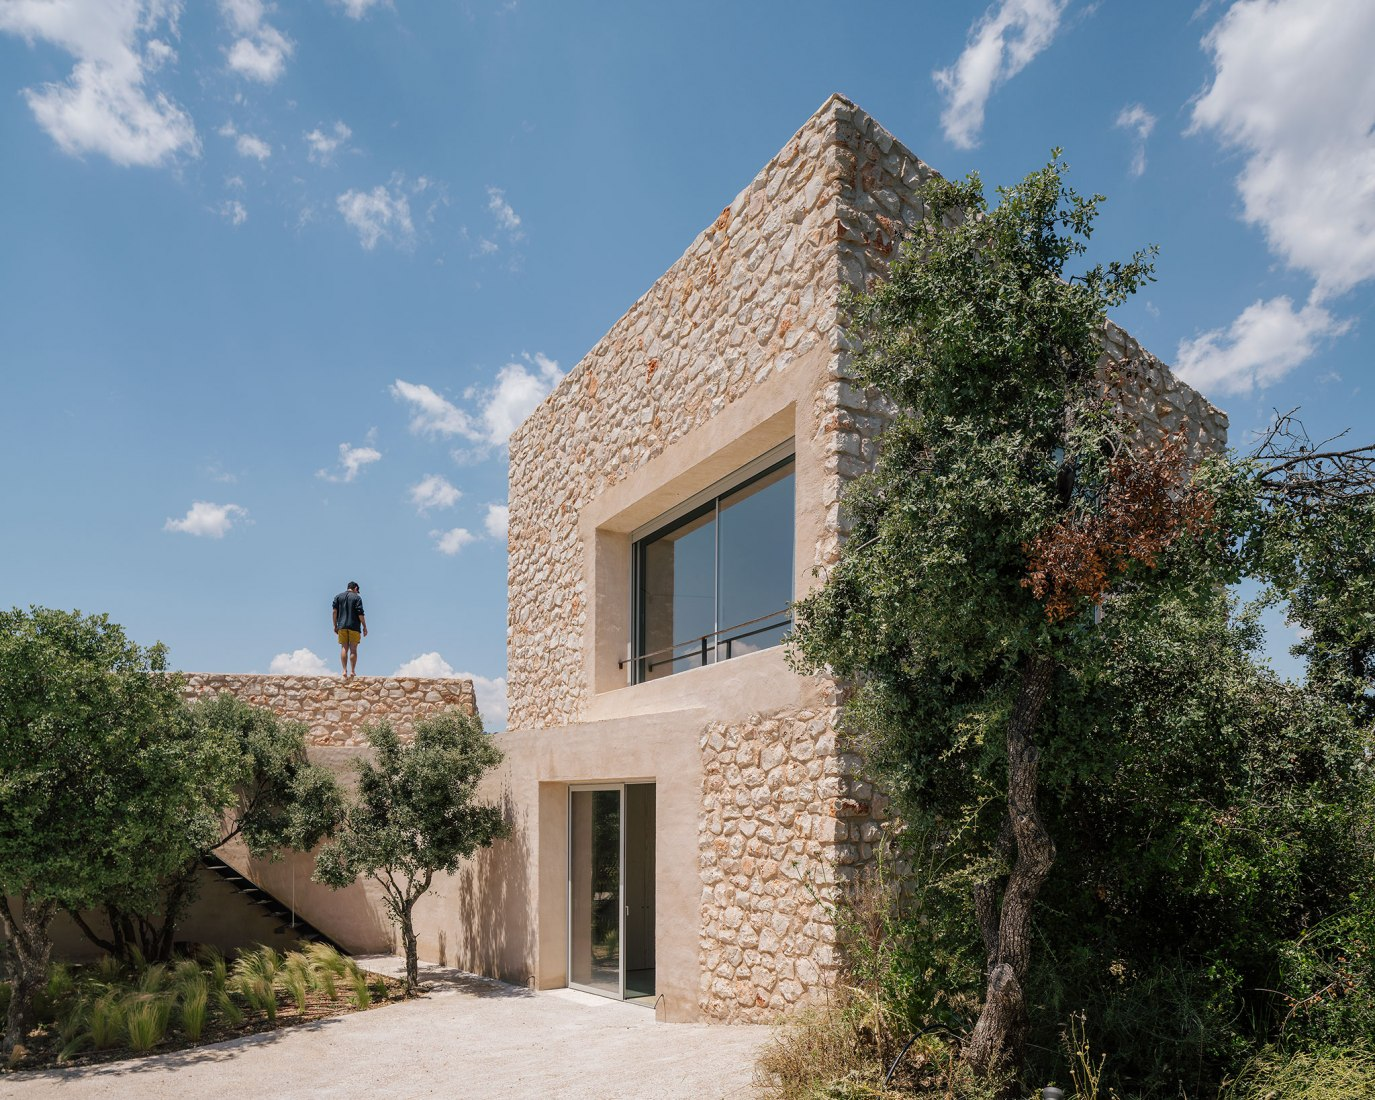 Villa Icaria by Arquitectura al descubierto. Photograph by Imagen Subliminal.